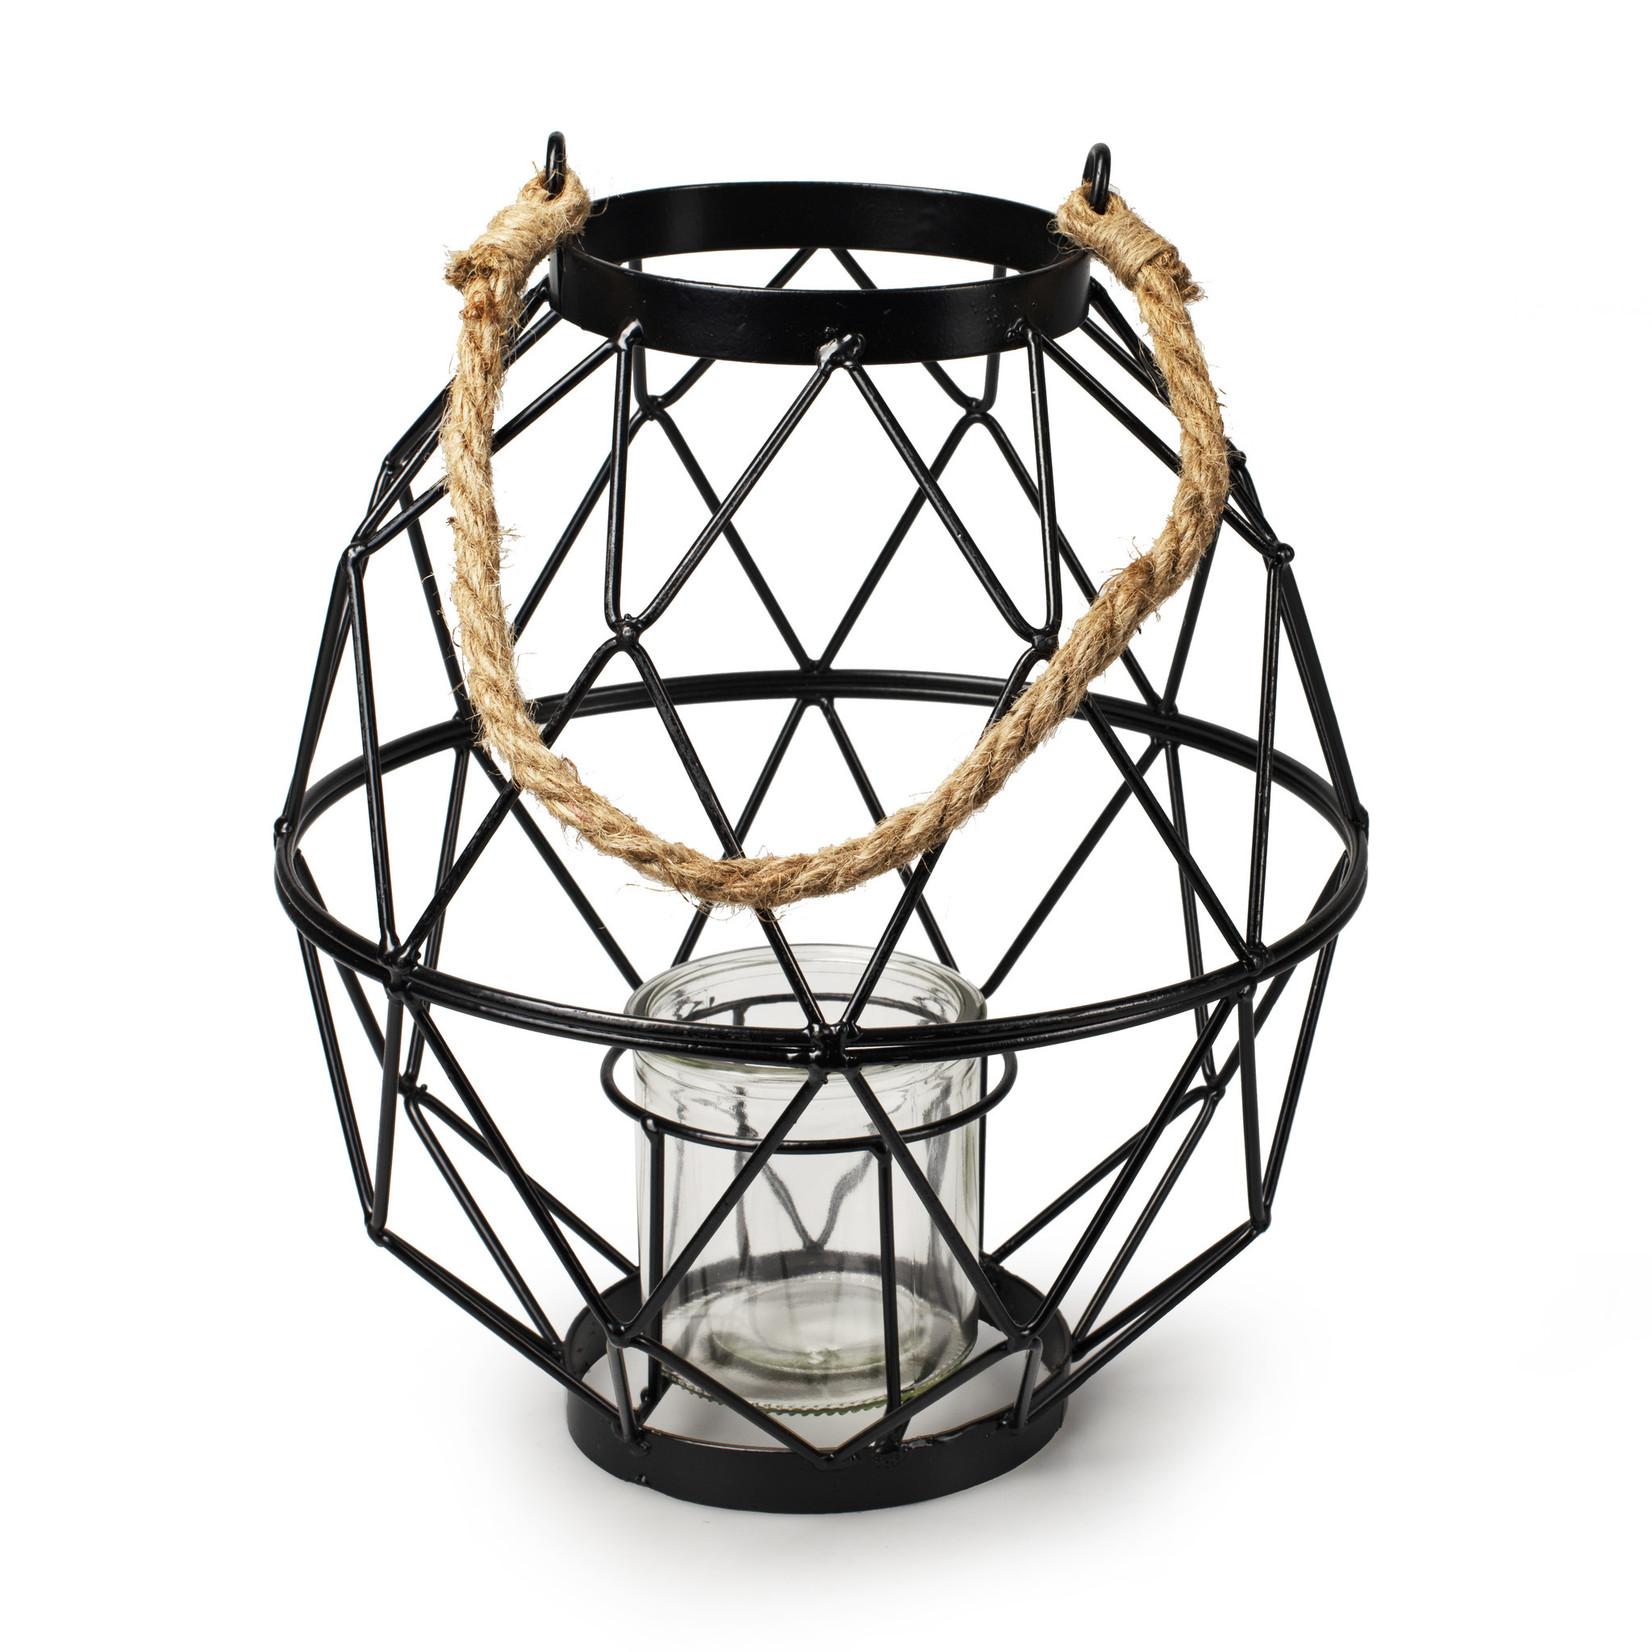 Jodeco Glass Metalen lantaarn 'Meyra'